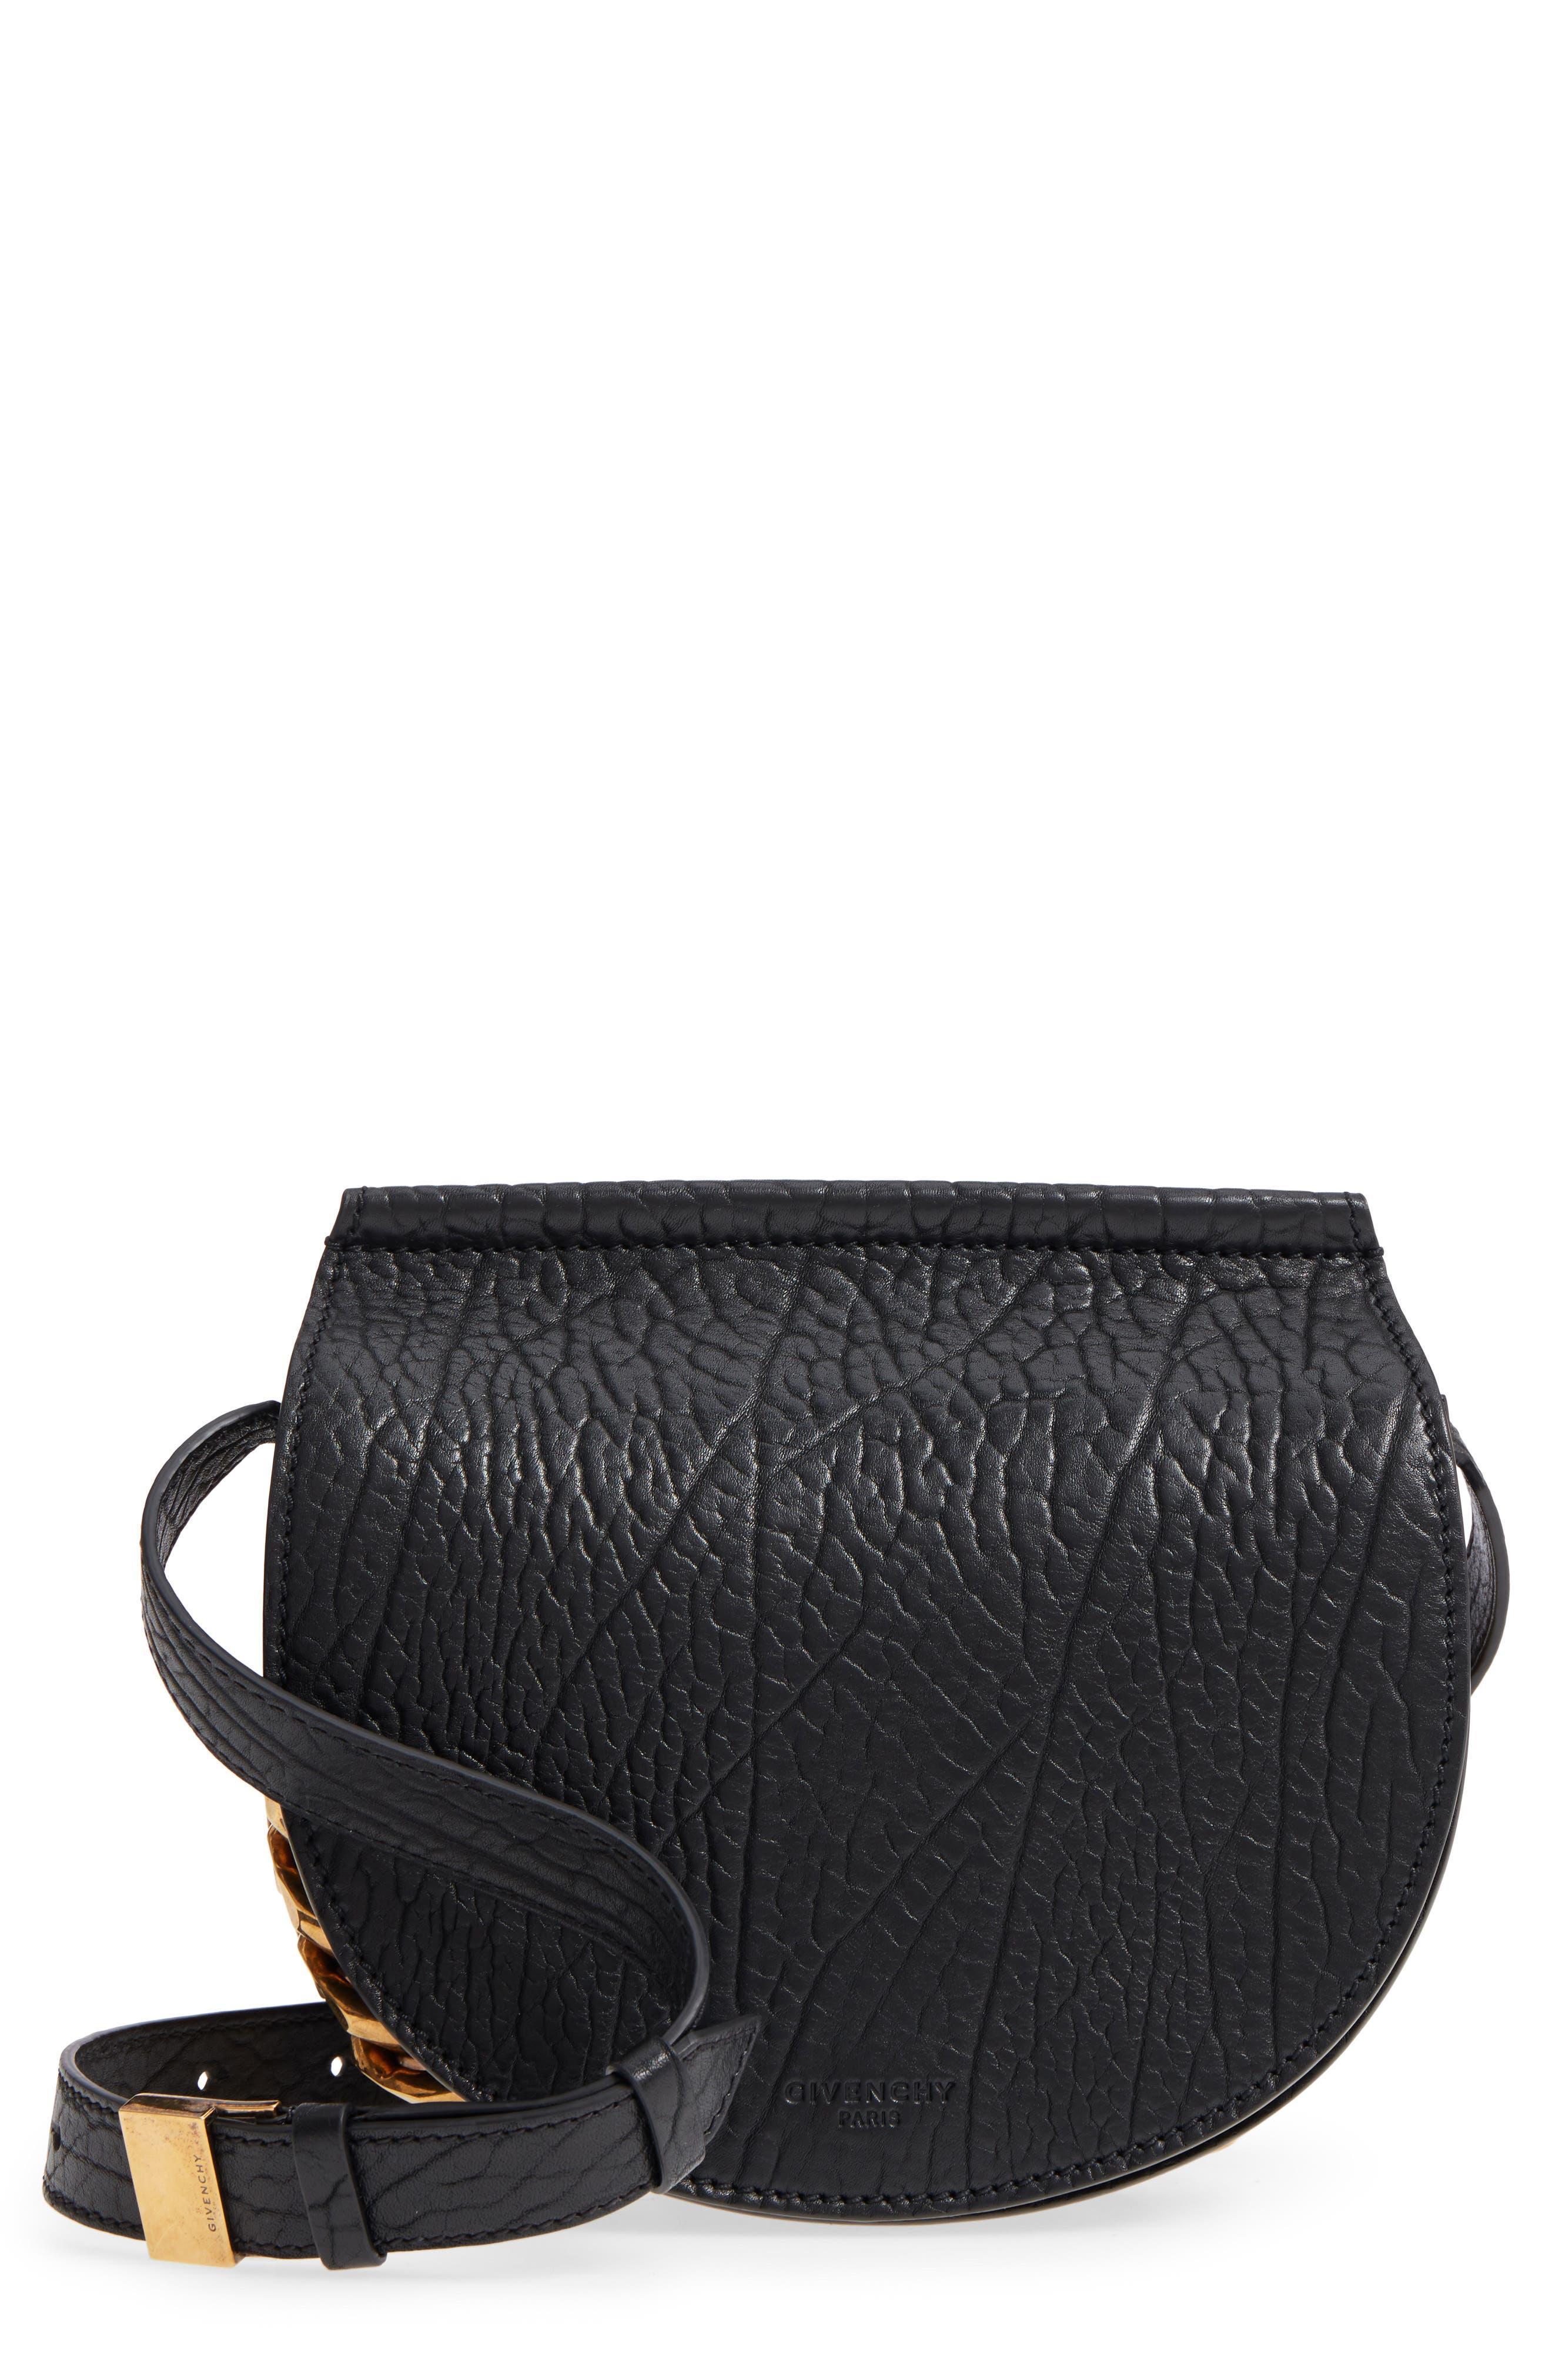 Infinity Calfskin Leather Saddle Bag,                             Main thumbnail 1, color,                             Black